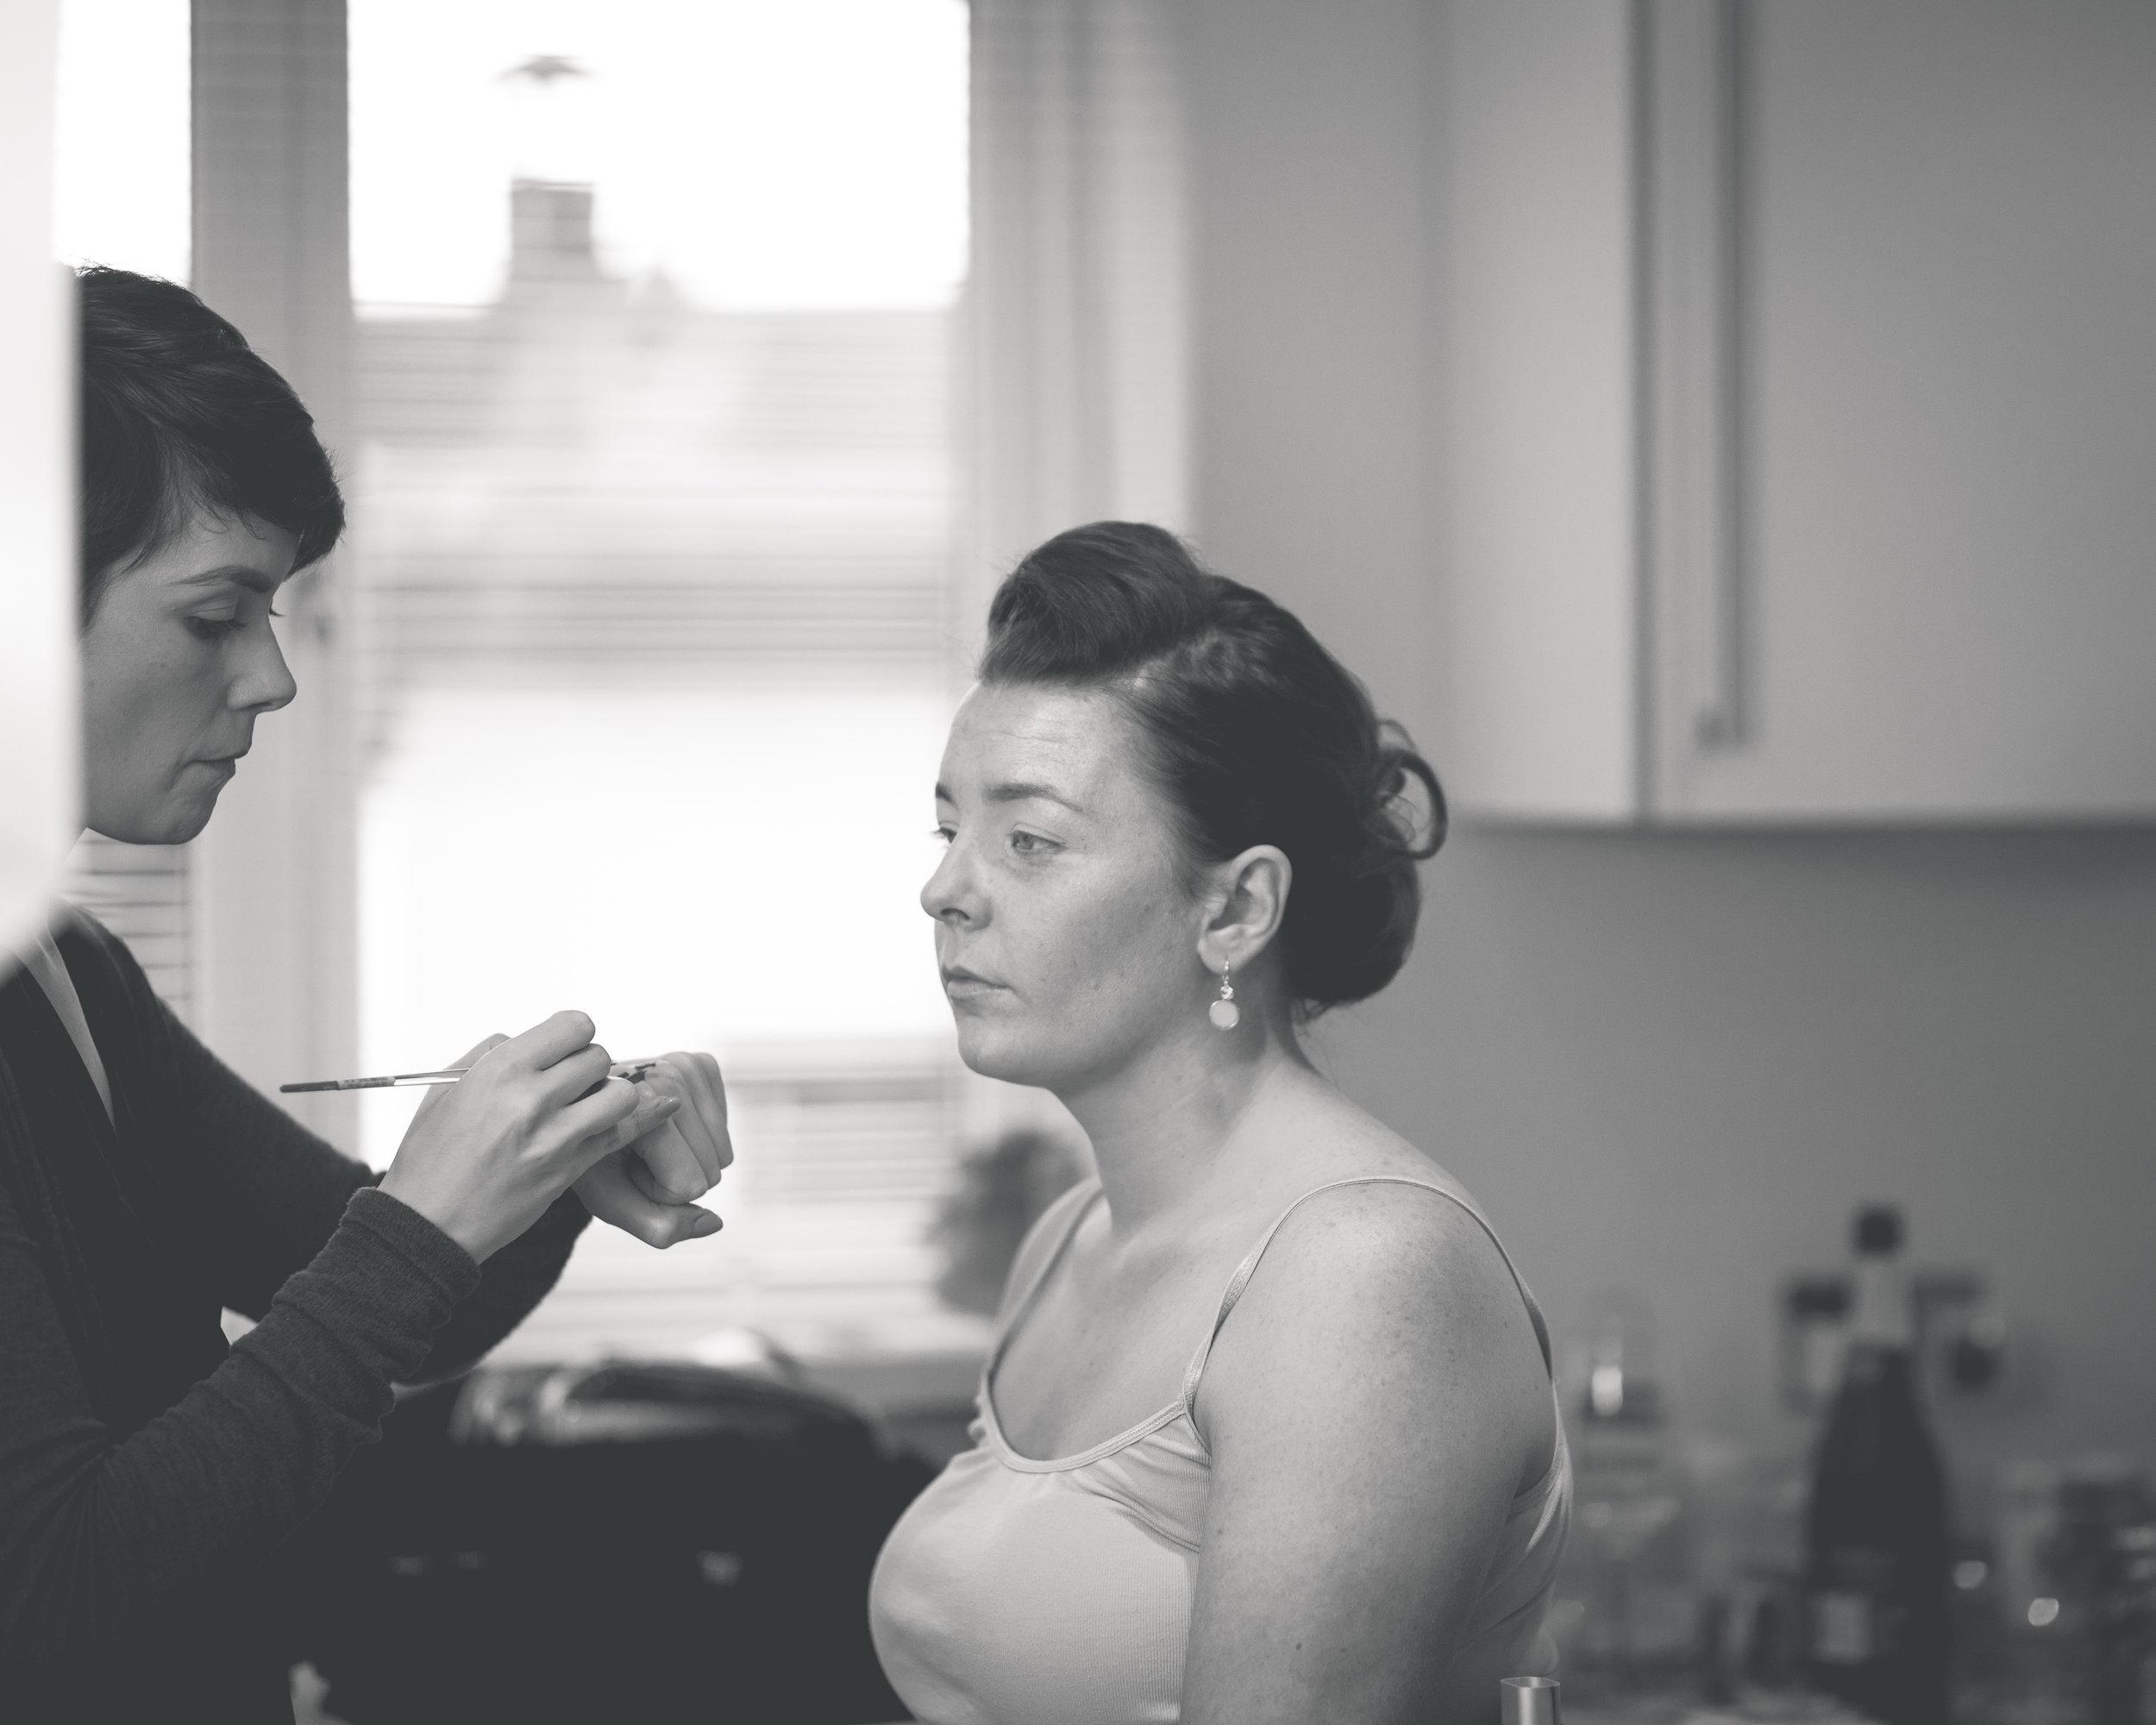 Antoinette & Stephen - Bridal Preparations | Brian McEwan Photography | Wedding Photographer Northern Ireland 1.jpg